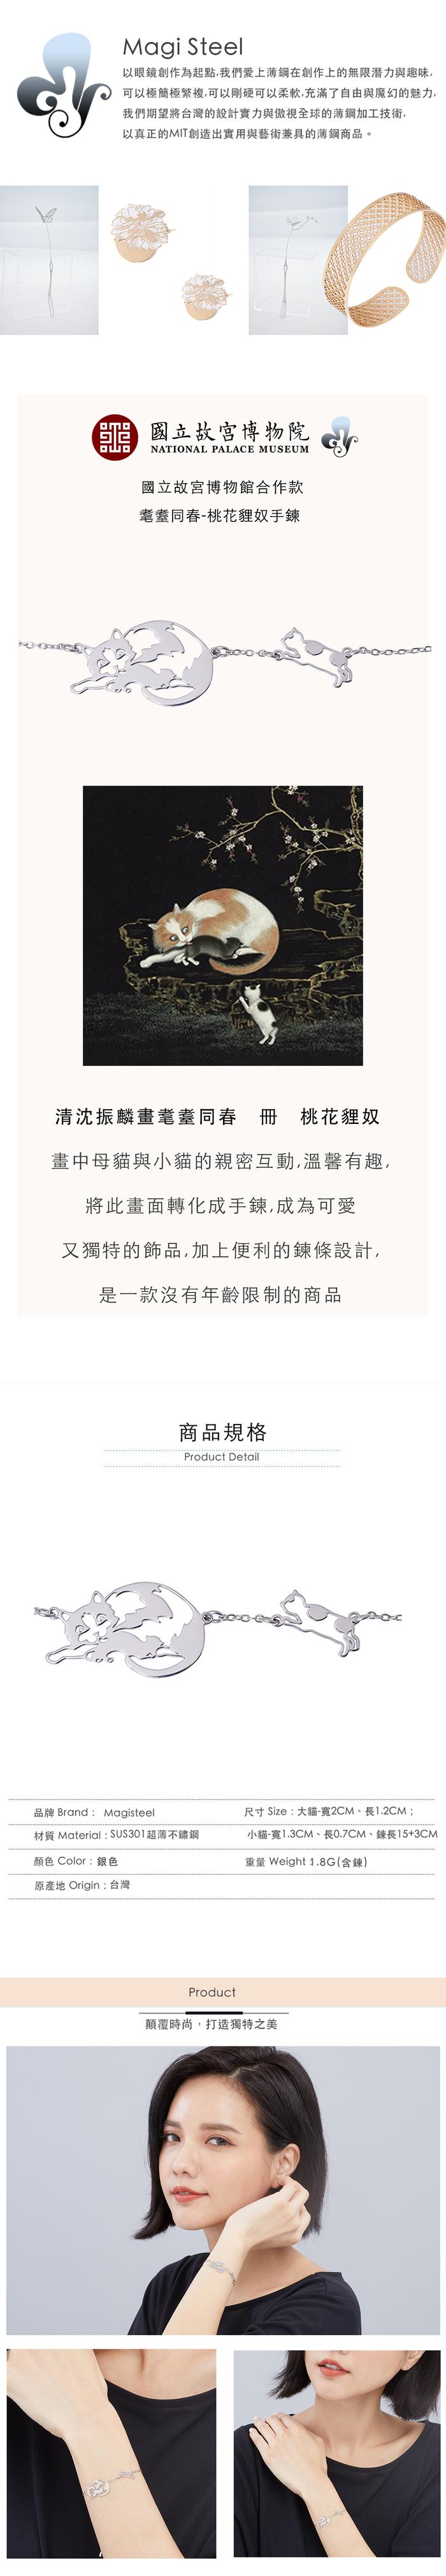 Magi-Steel|故宮聯名商品 耄耋同春-桃花貍奴手鍊